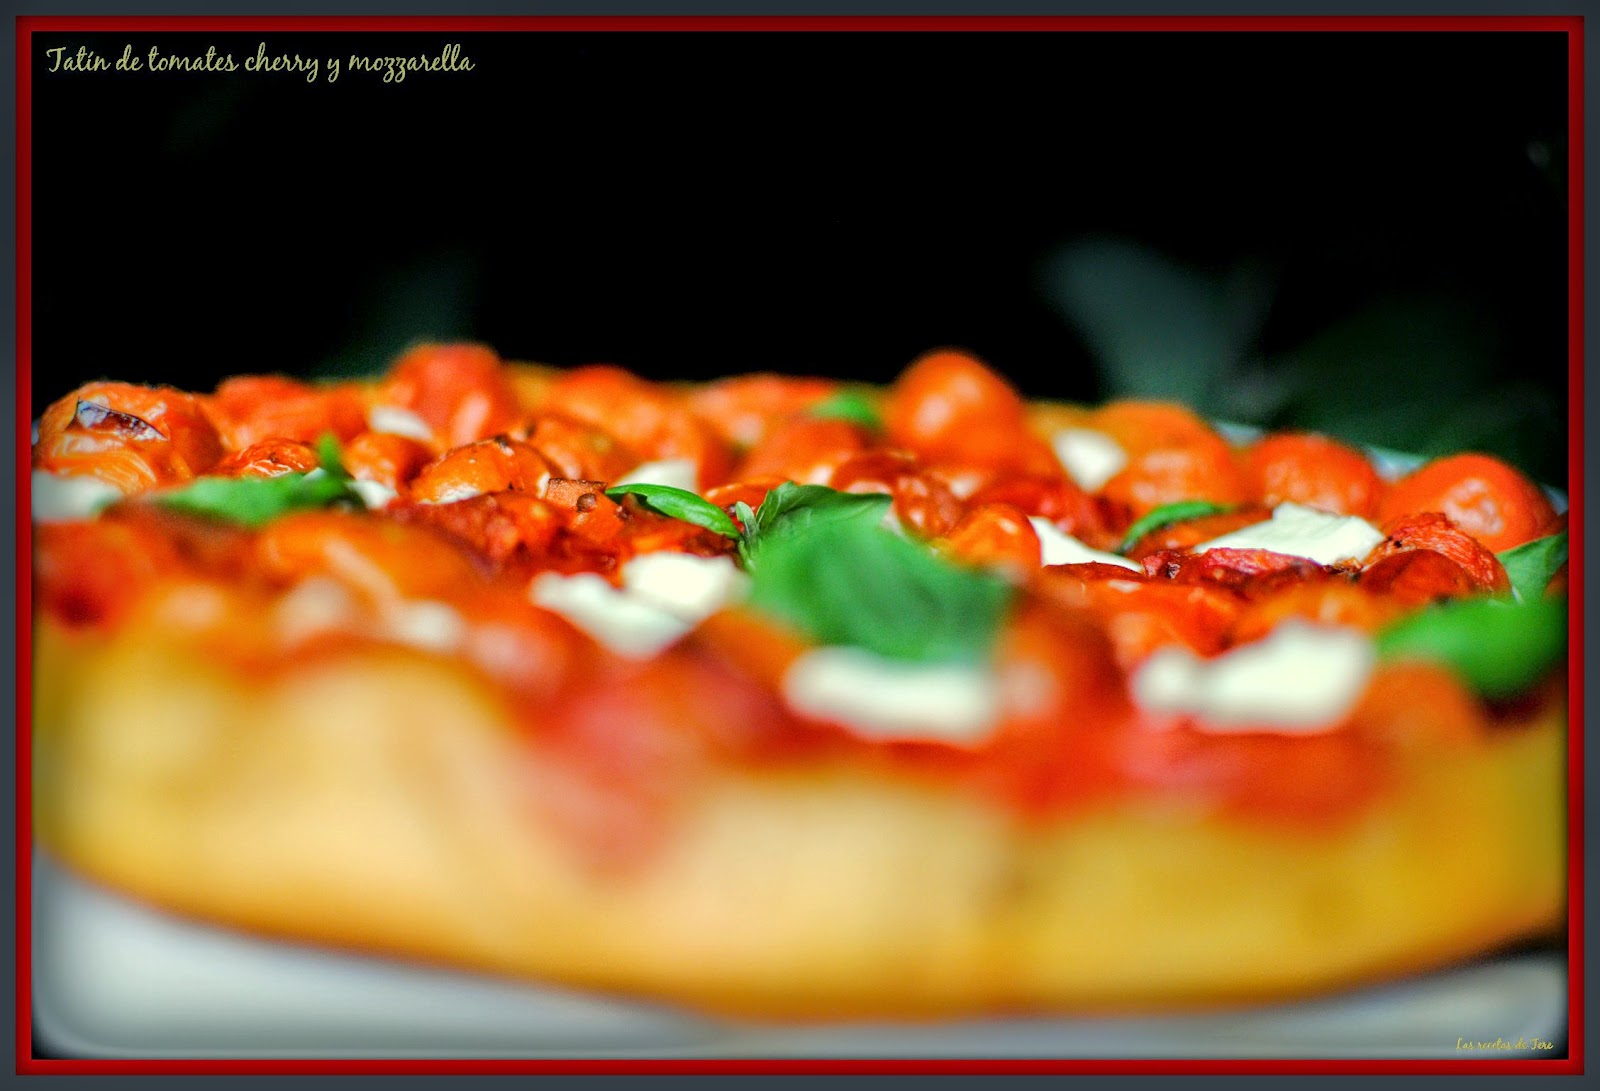 tatín de tomates cherry y mozzarella tererecetas 05